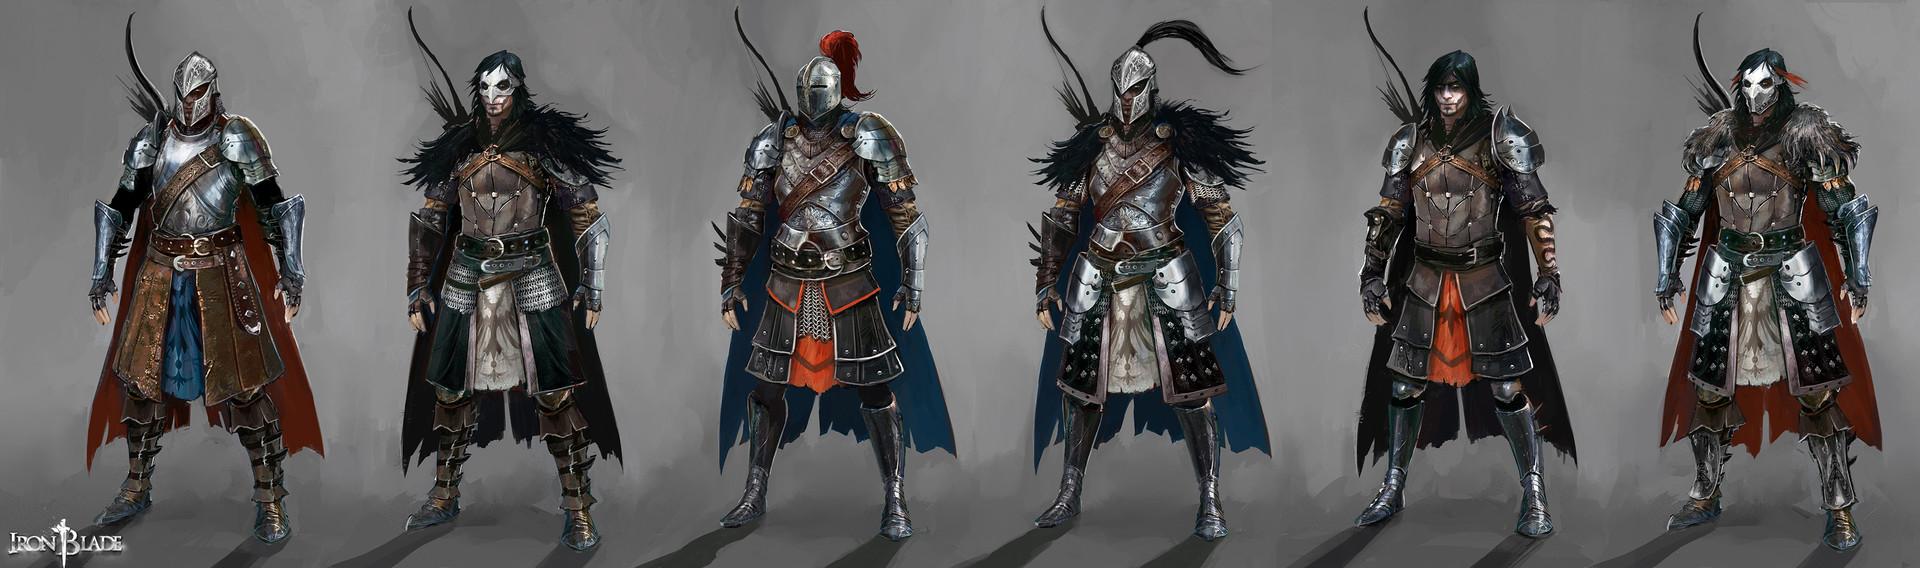 Alexandre chaudret hf armorset armors05